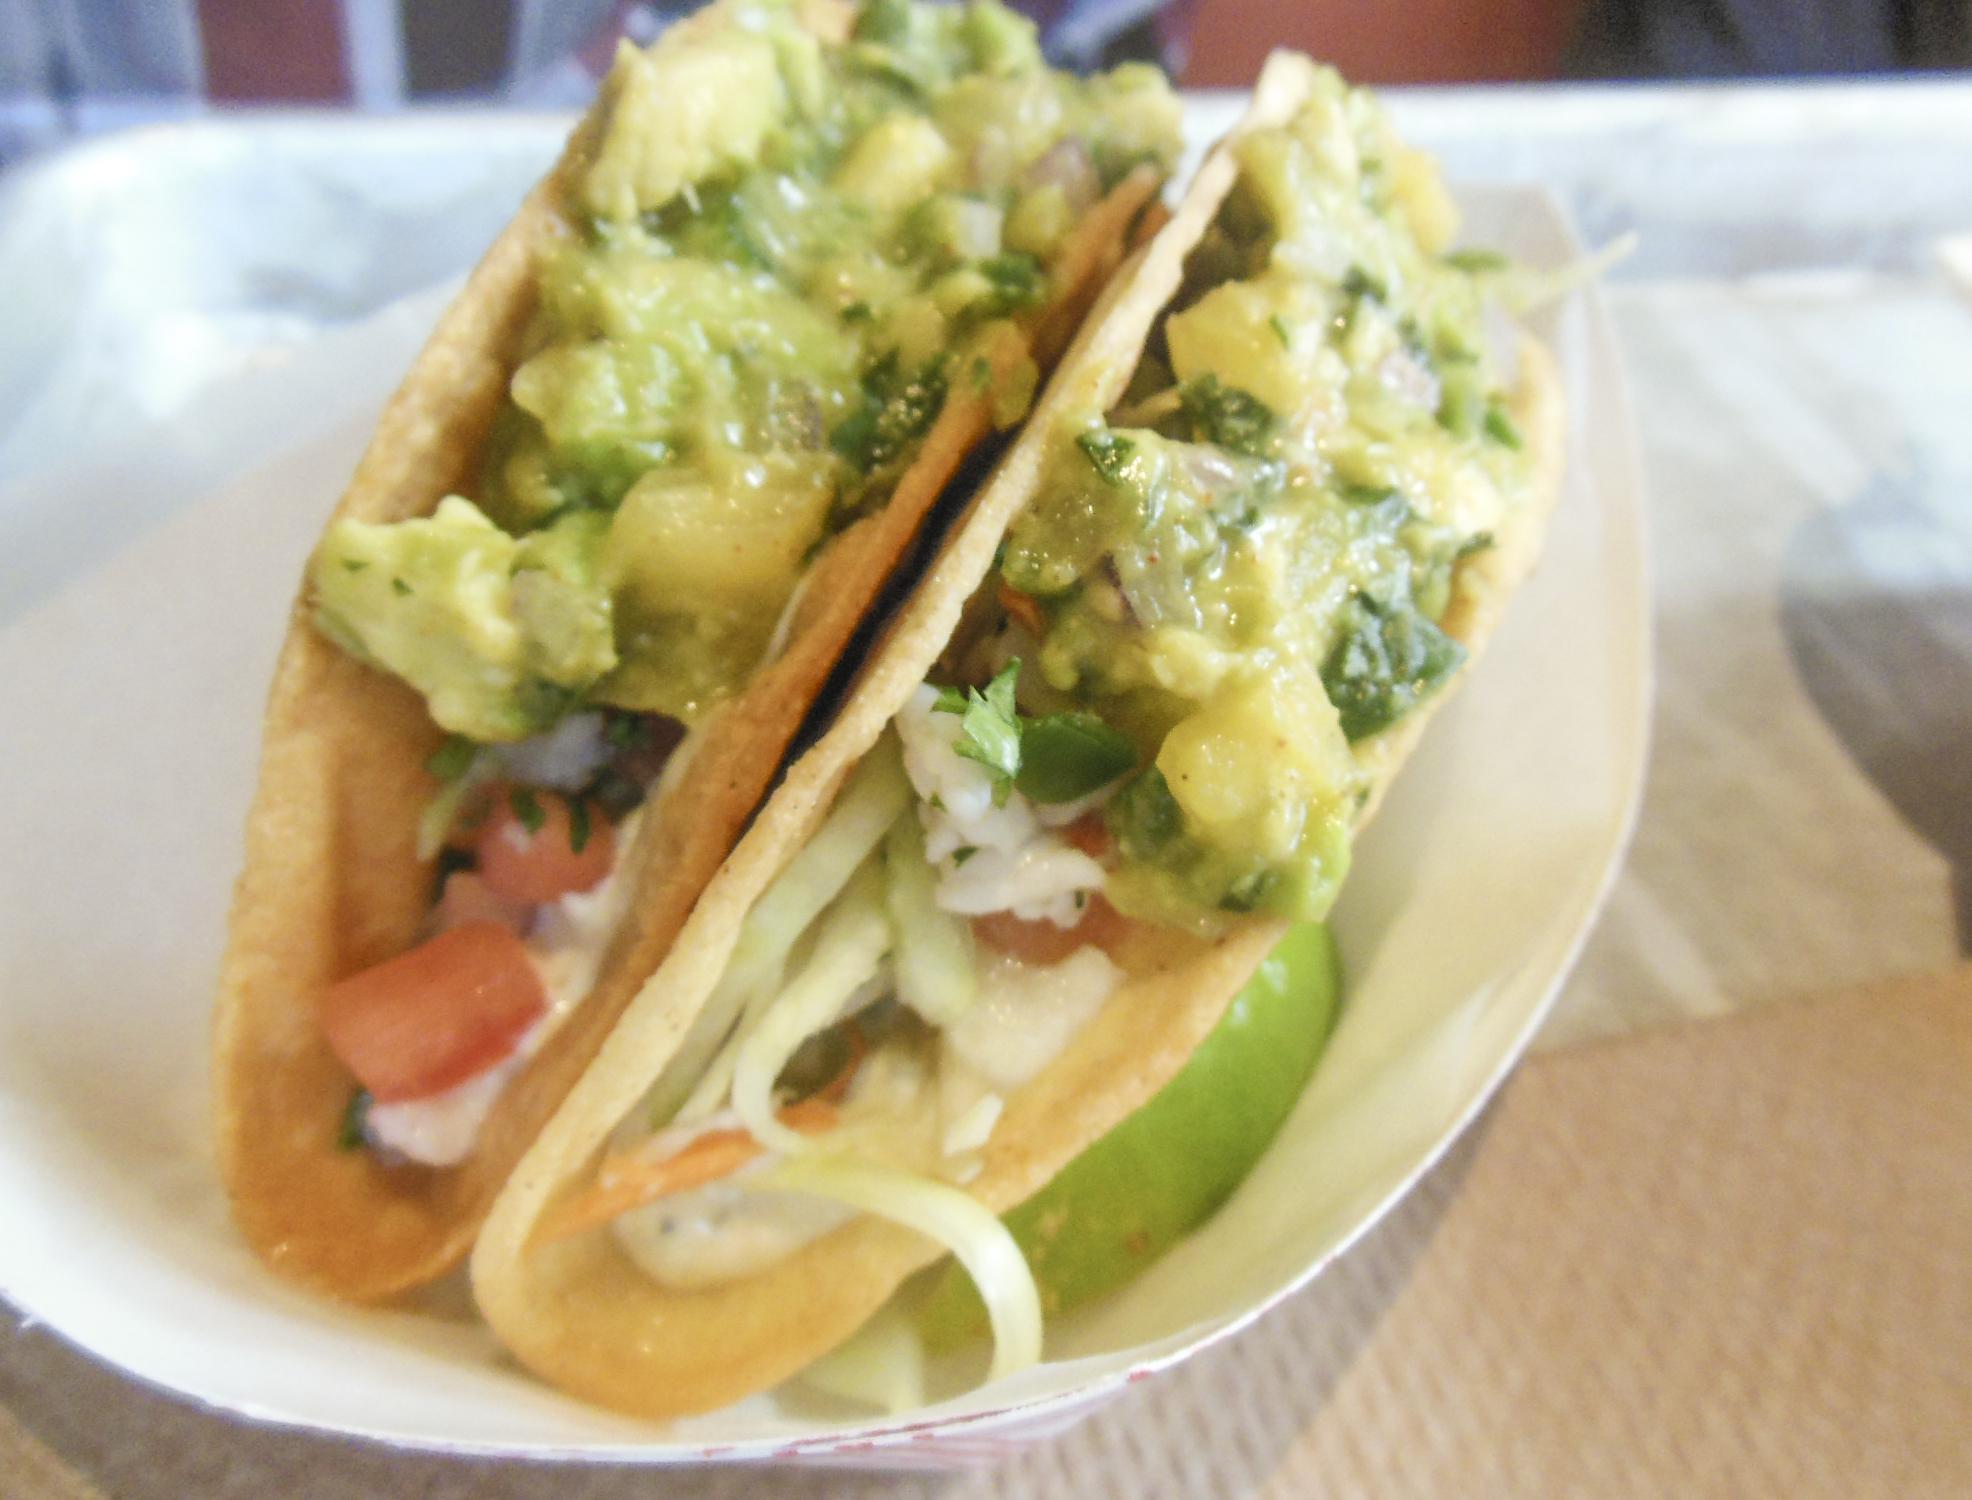 Ceviche Tacos at Genuine Roadside | Foodable WebTV Network